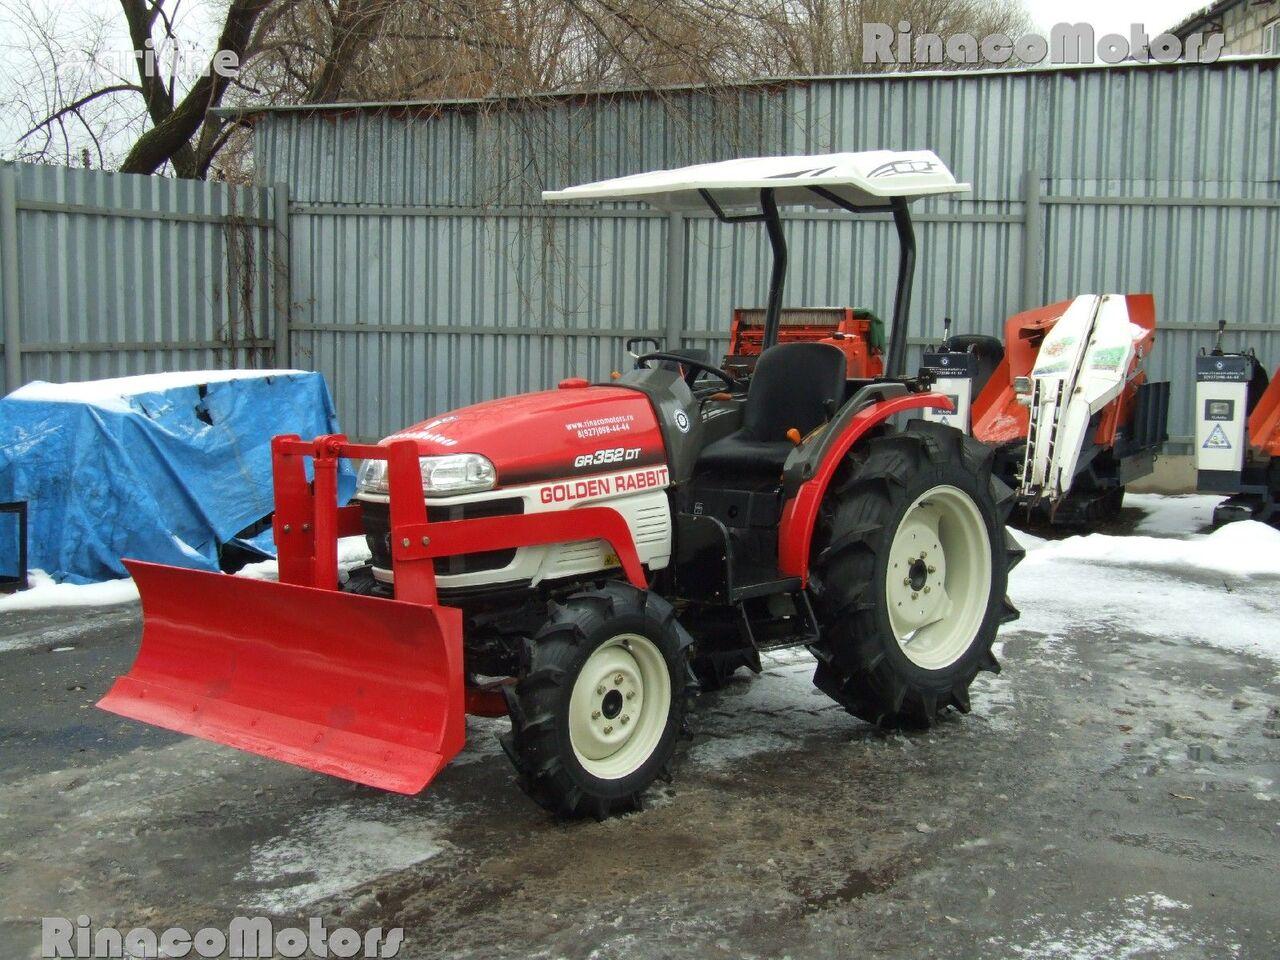 YANMAR GR352DT wheel tractor